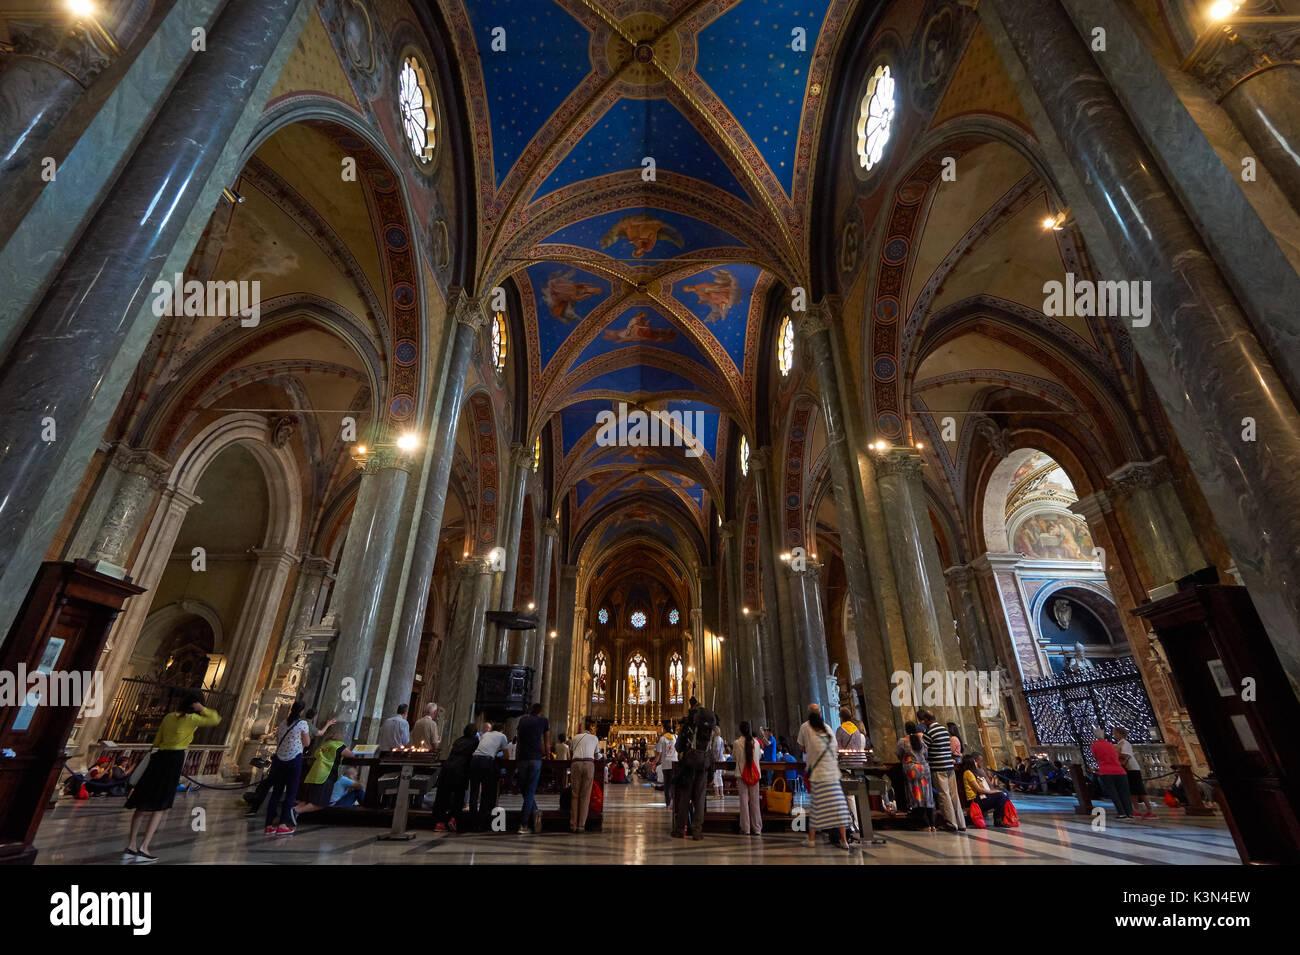 Santa Maria sopra Minerva church in Rome, Italy Stock Photo